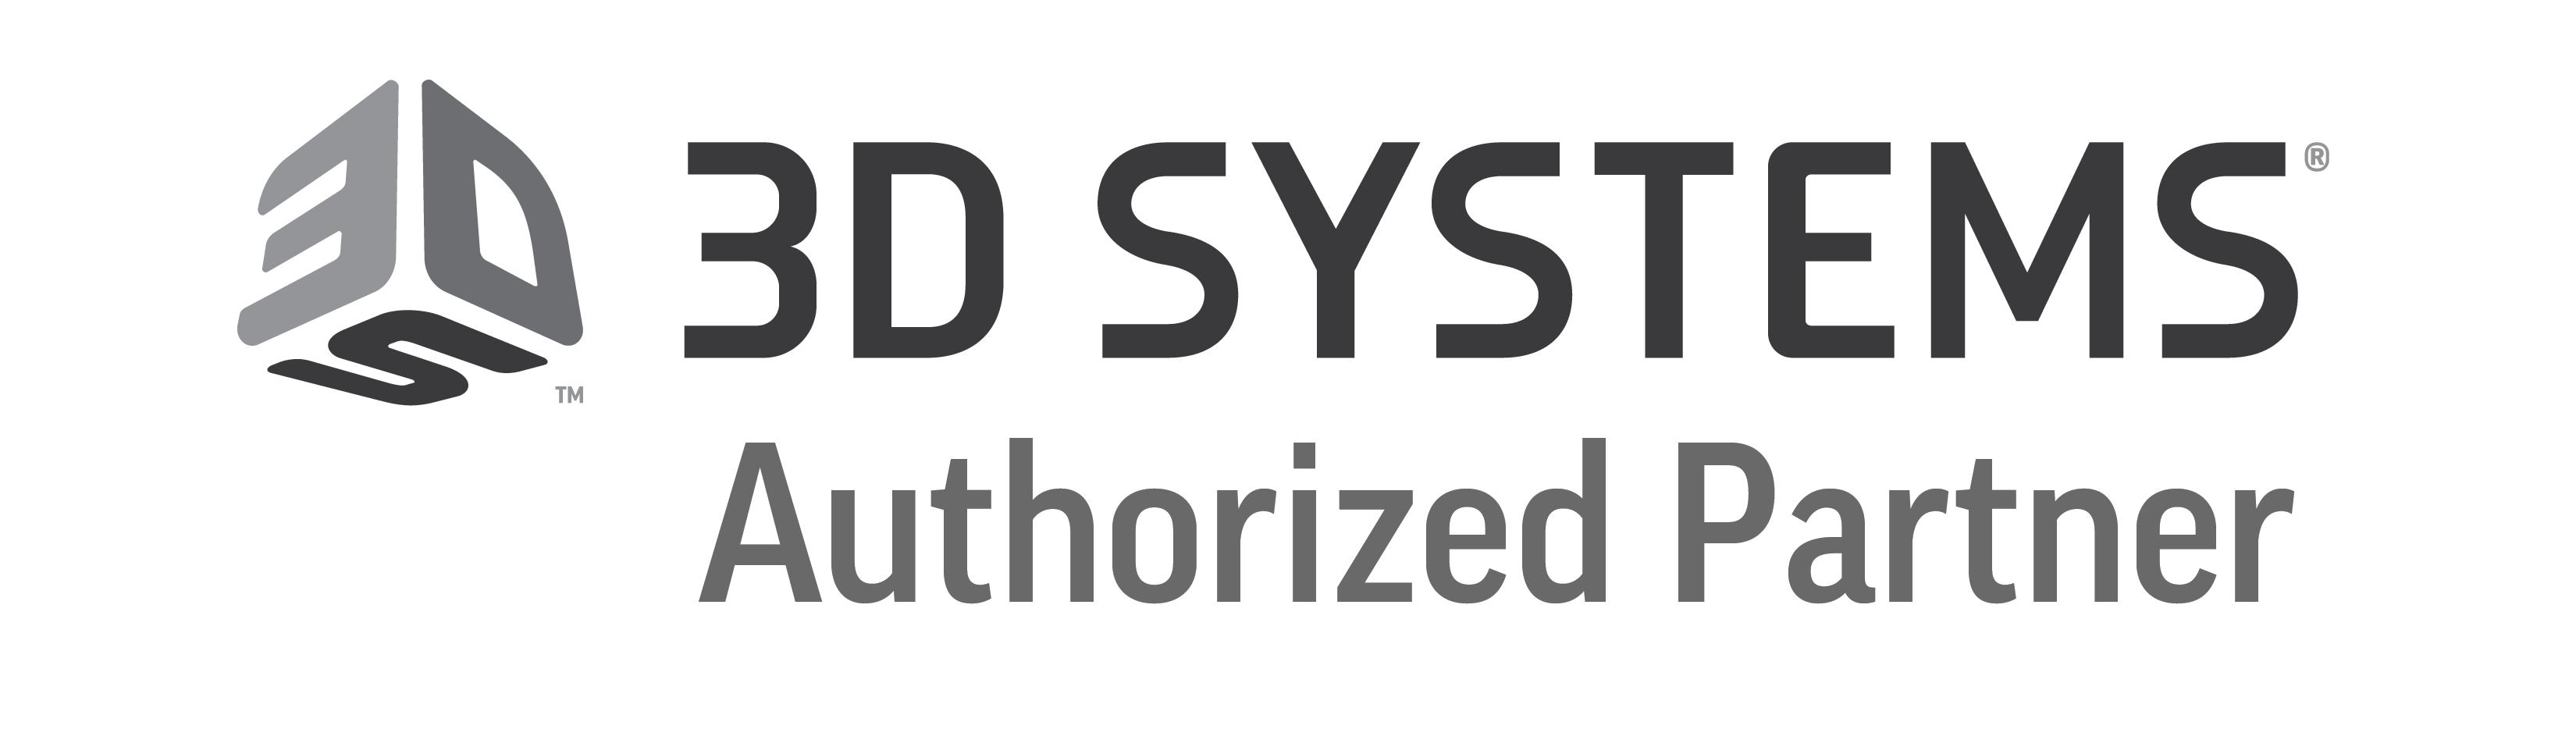 Partner-Logo-Light-3D-Systems-1.png